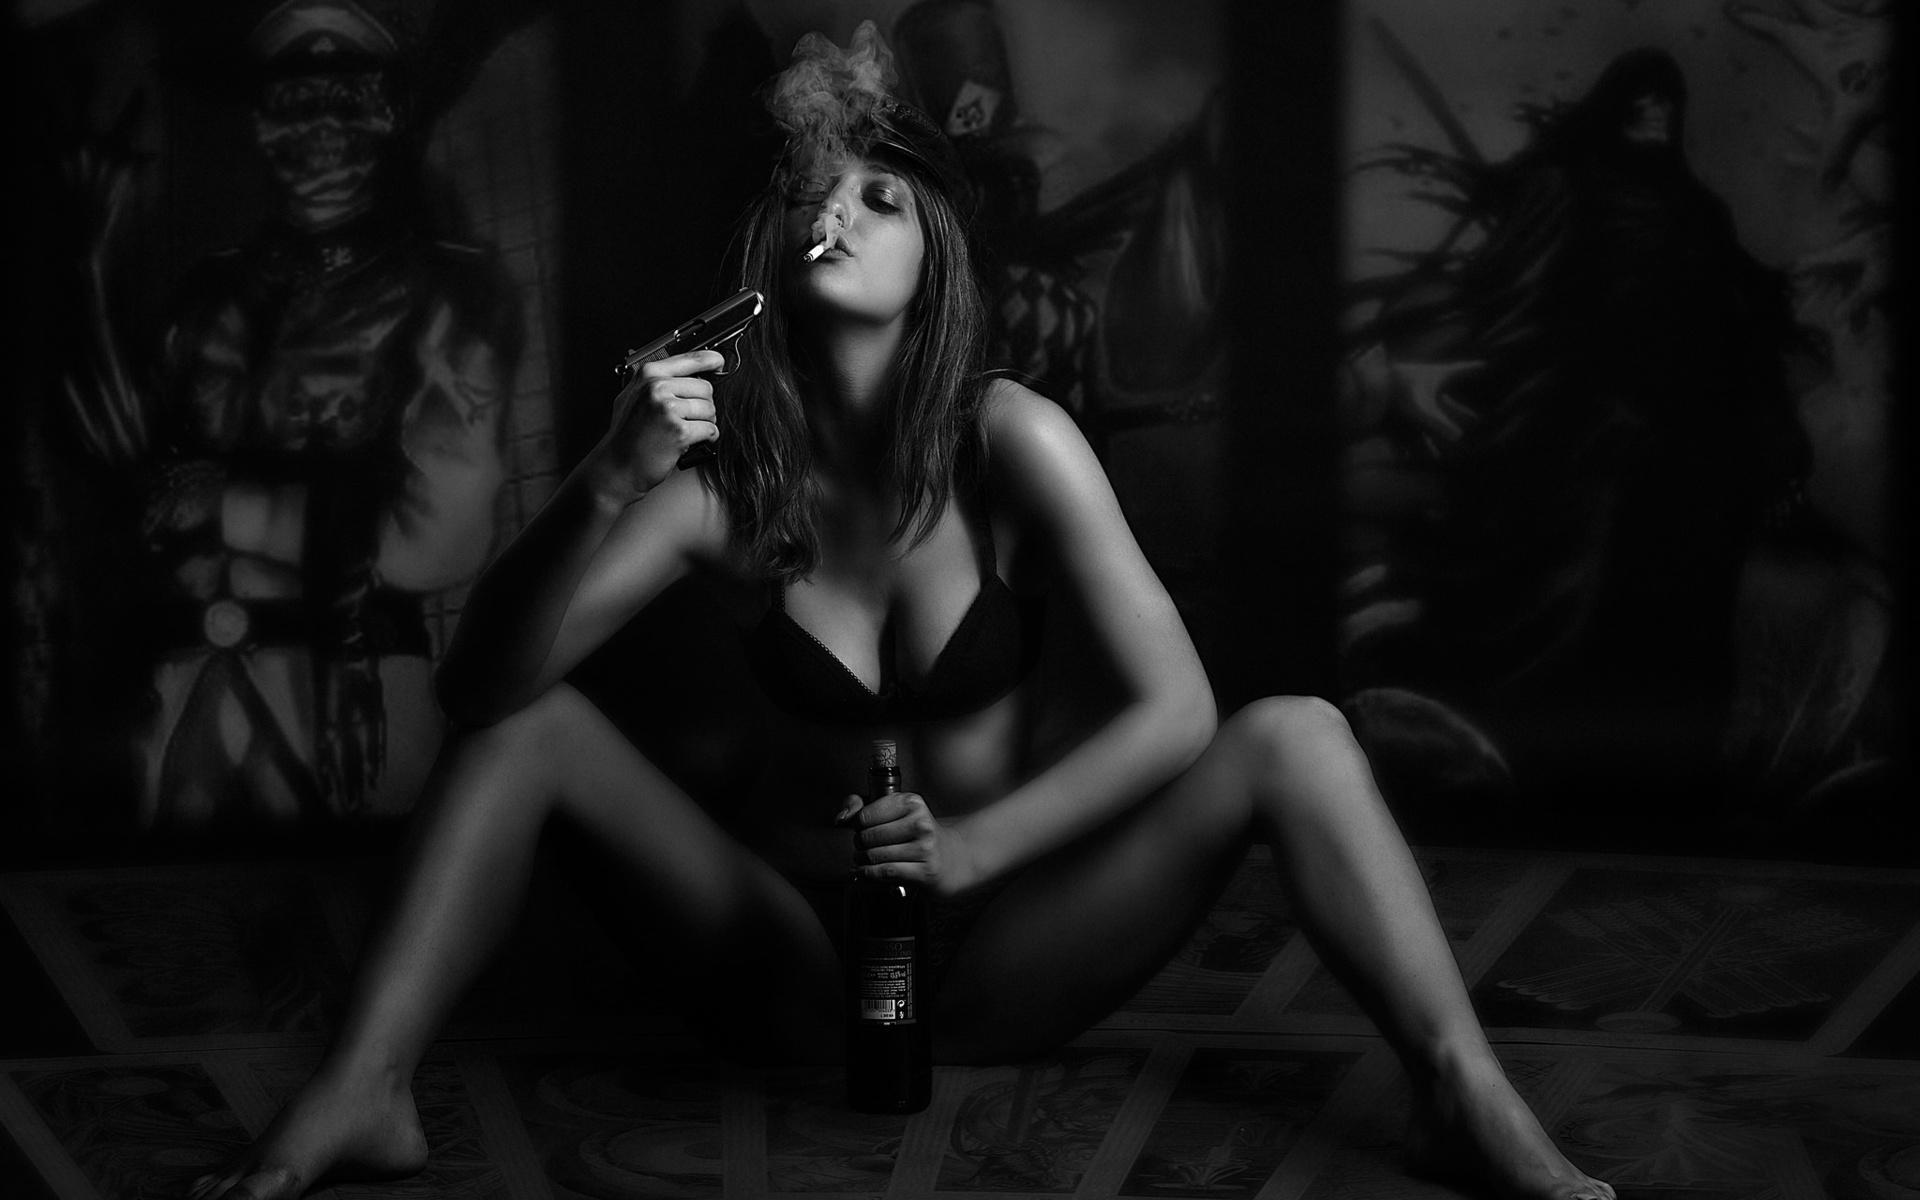 Картинки на телефон девушки с сигаретой